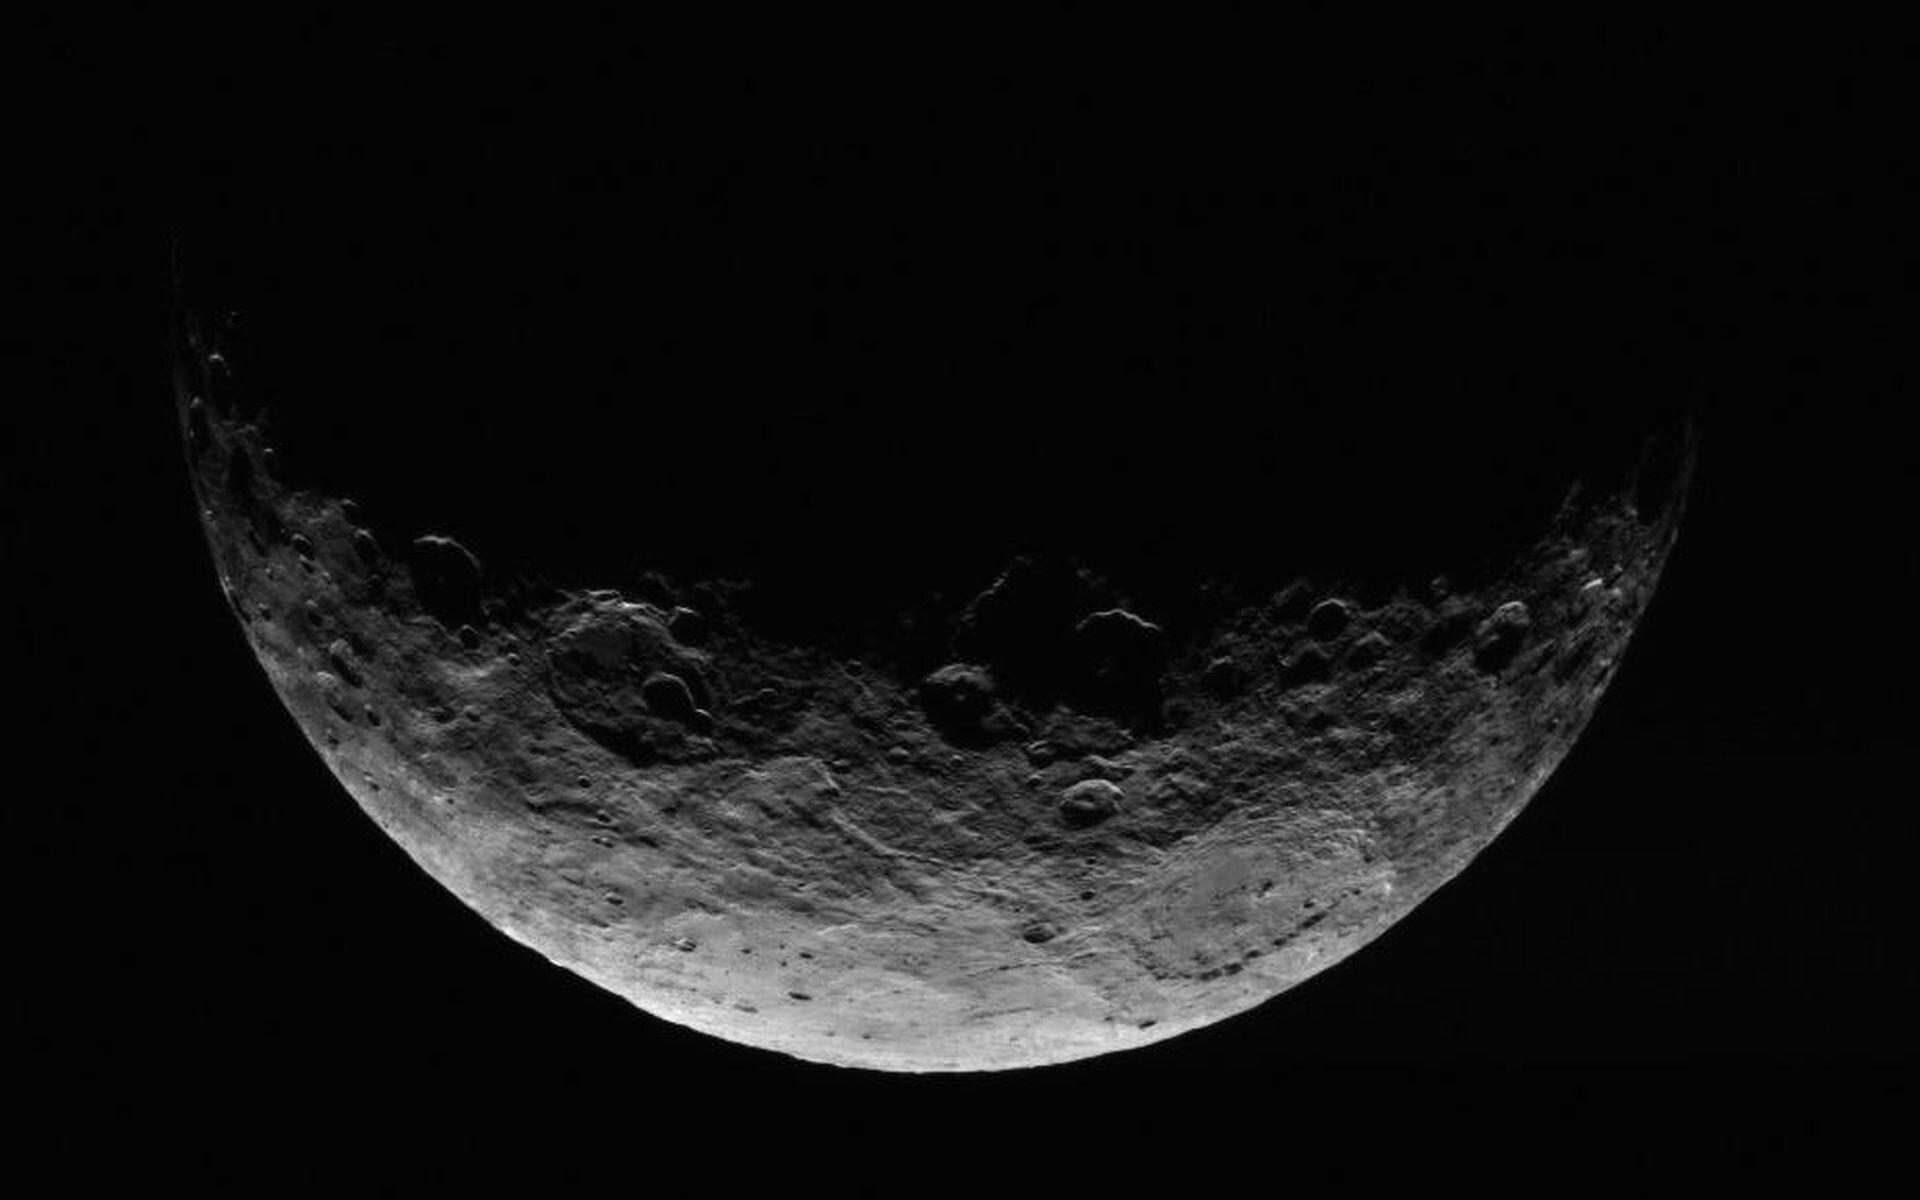 NASA Moon Wallpapers: HD, 4K, 5K for PC ...